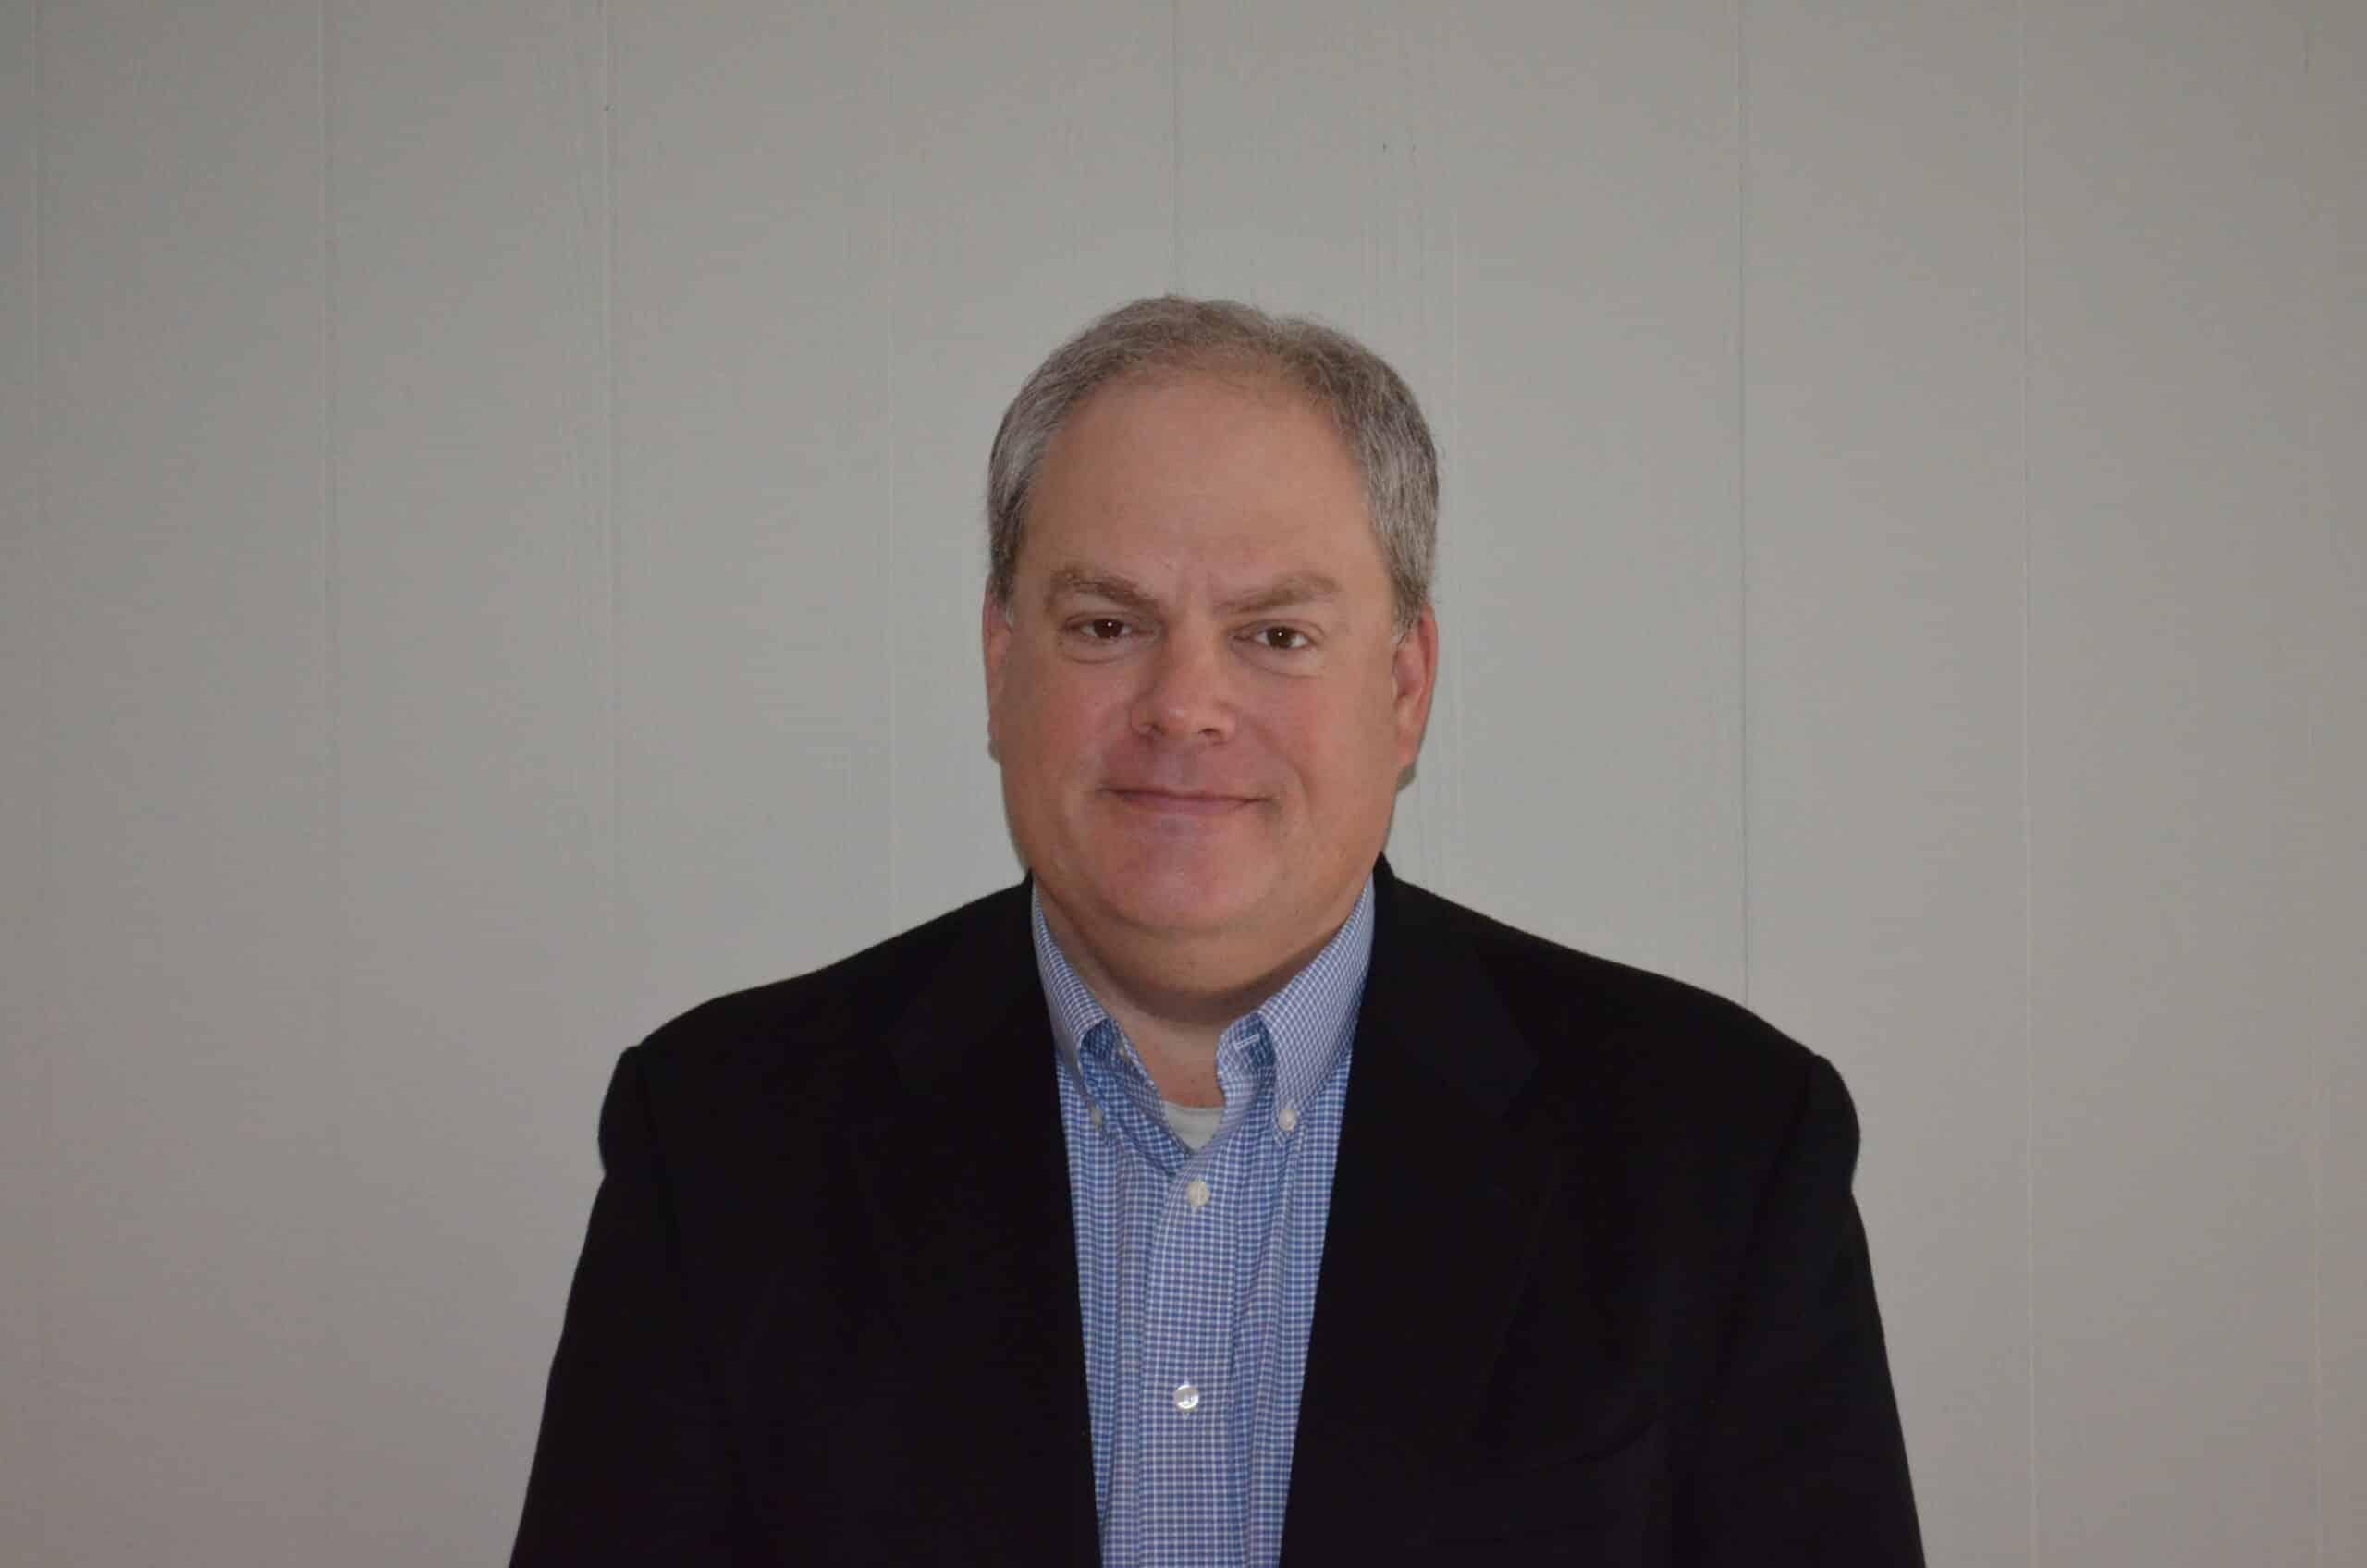 Scott Williams, VP of Finance